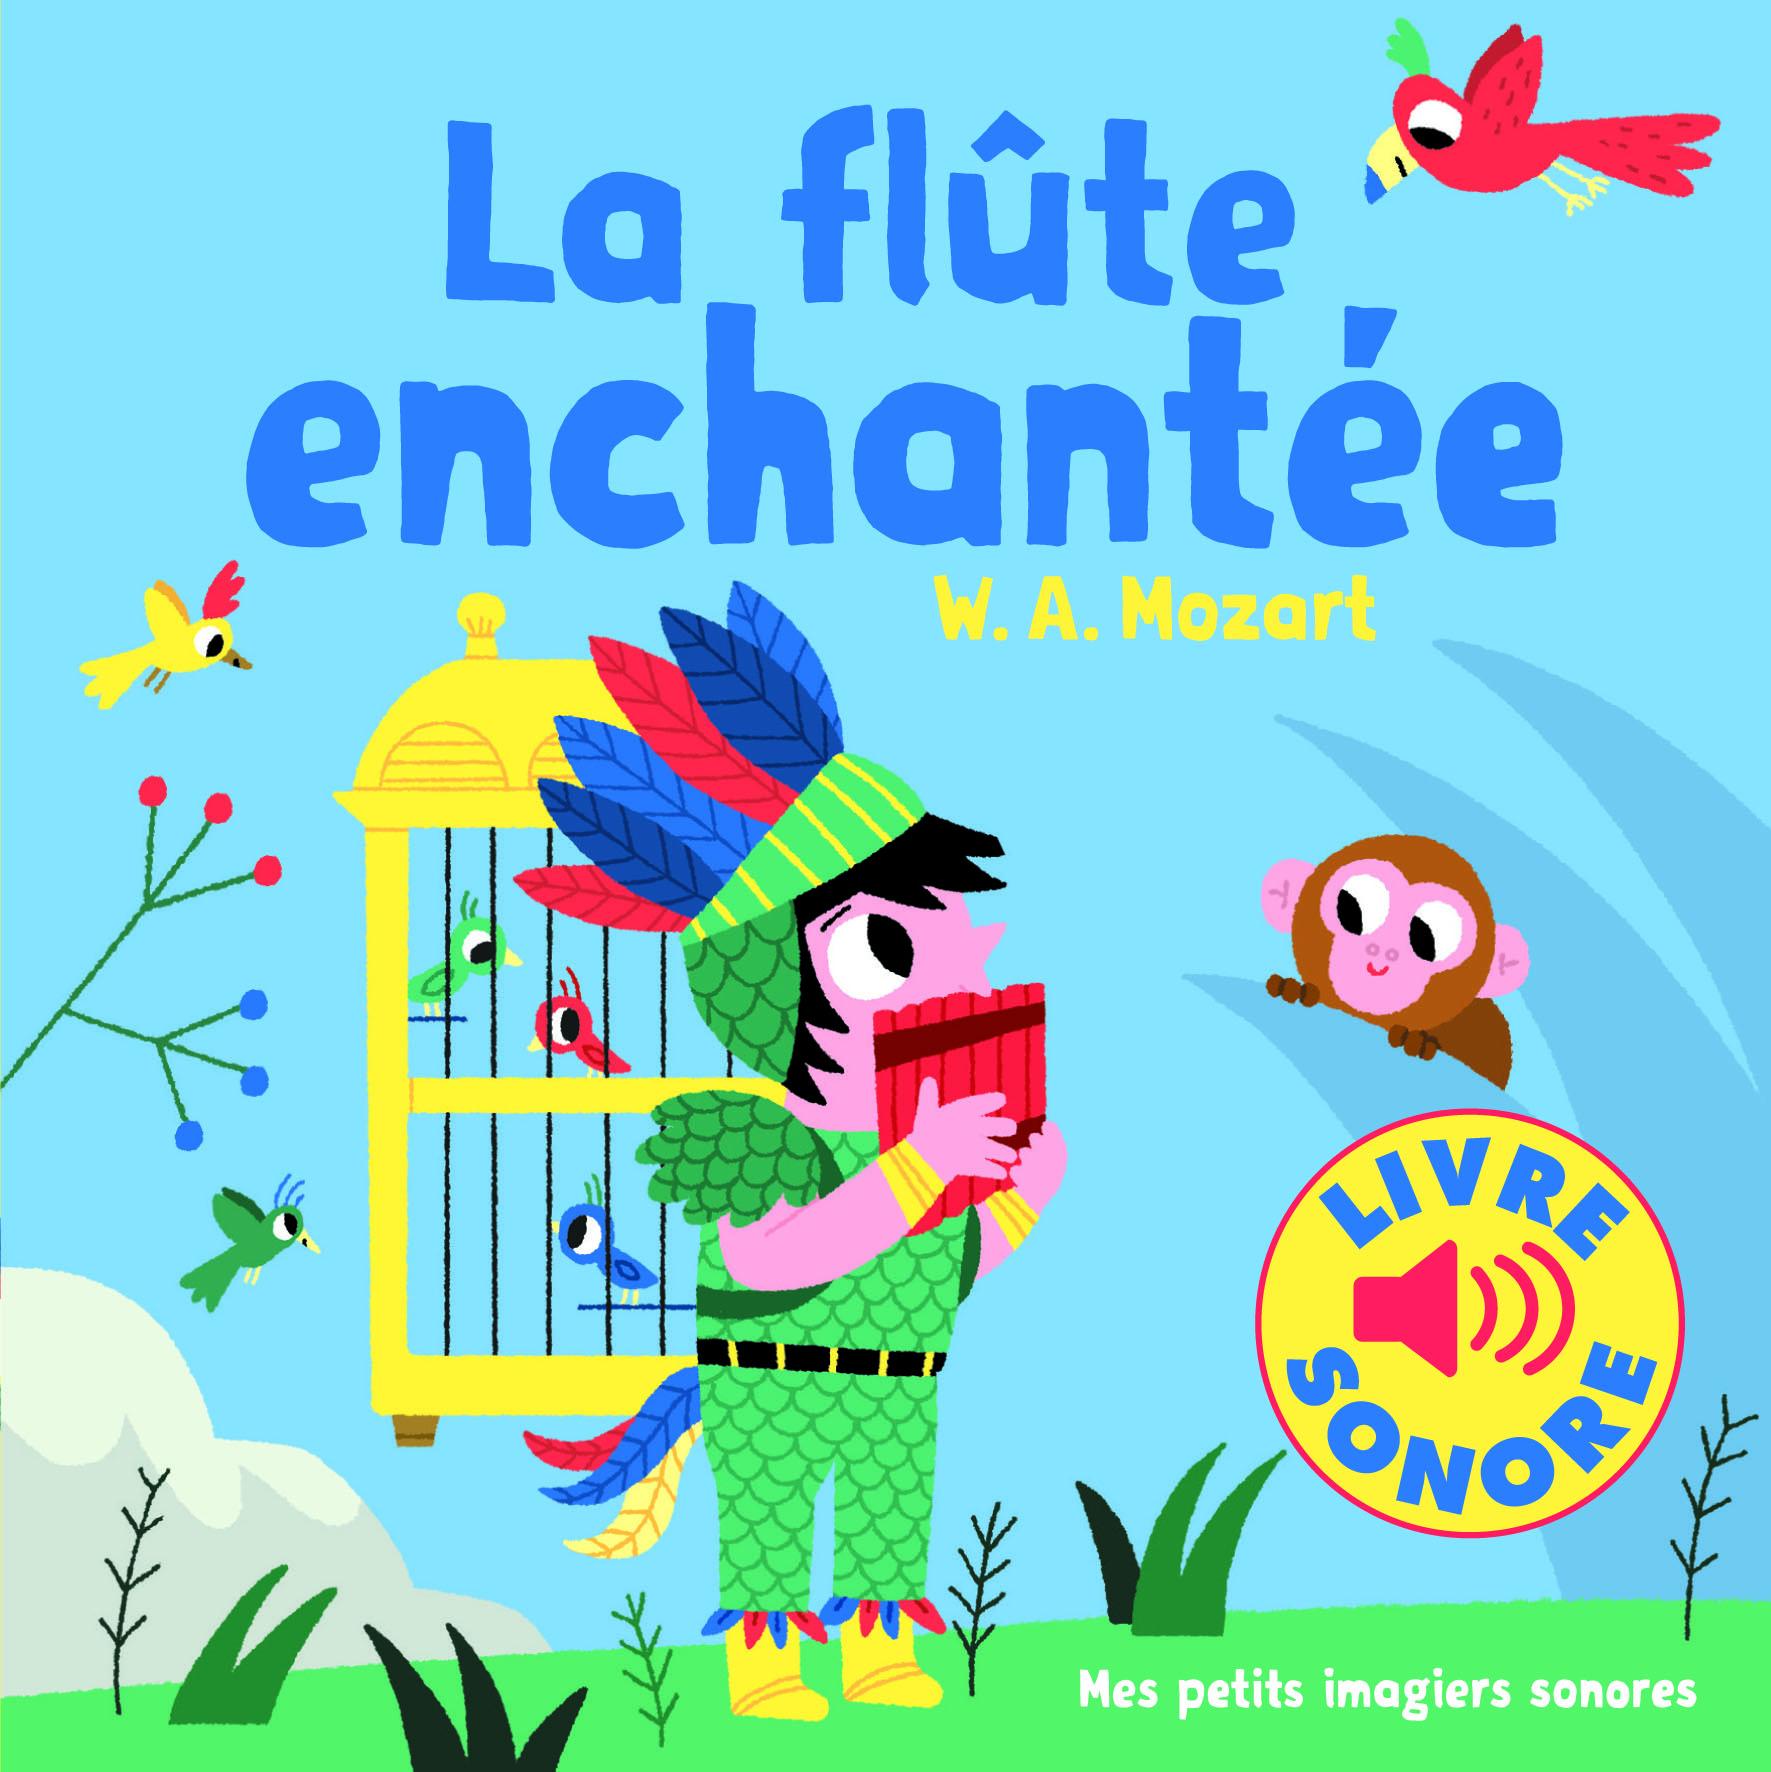 La Flute Enchantee Mes Petits Imagiers Sonores Gallimard